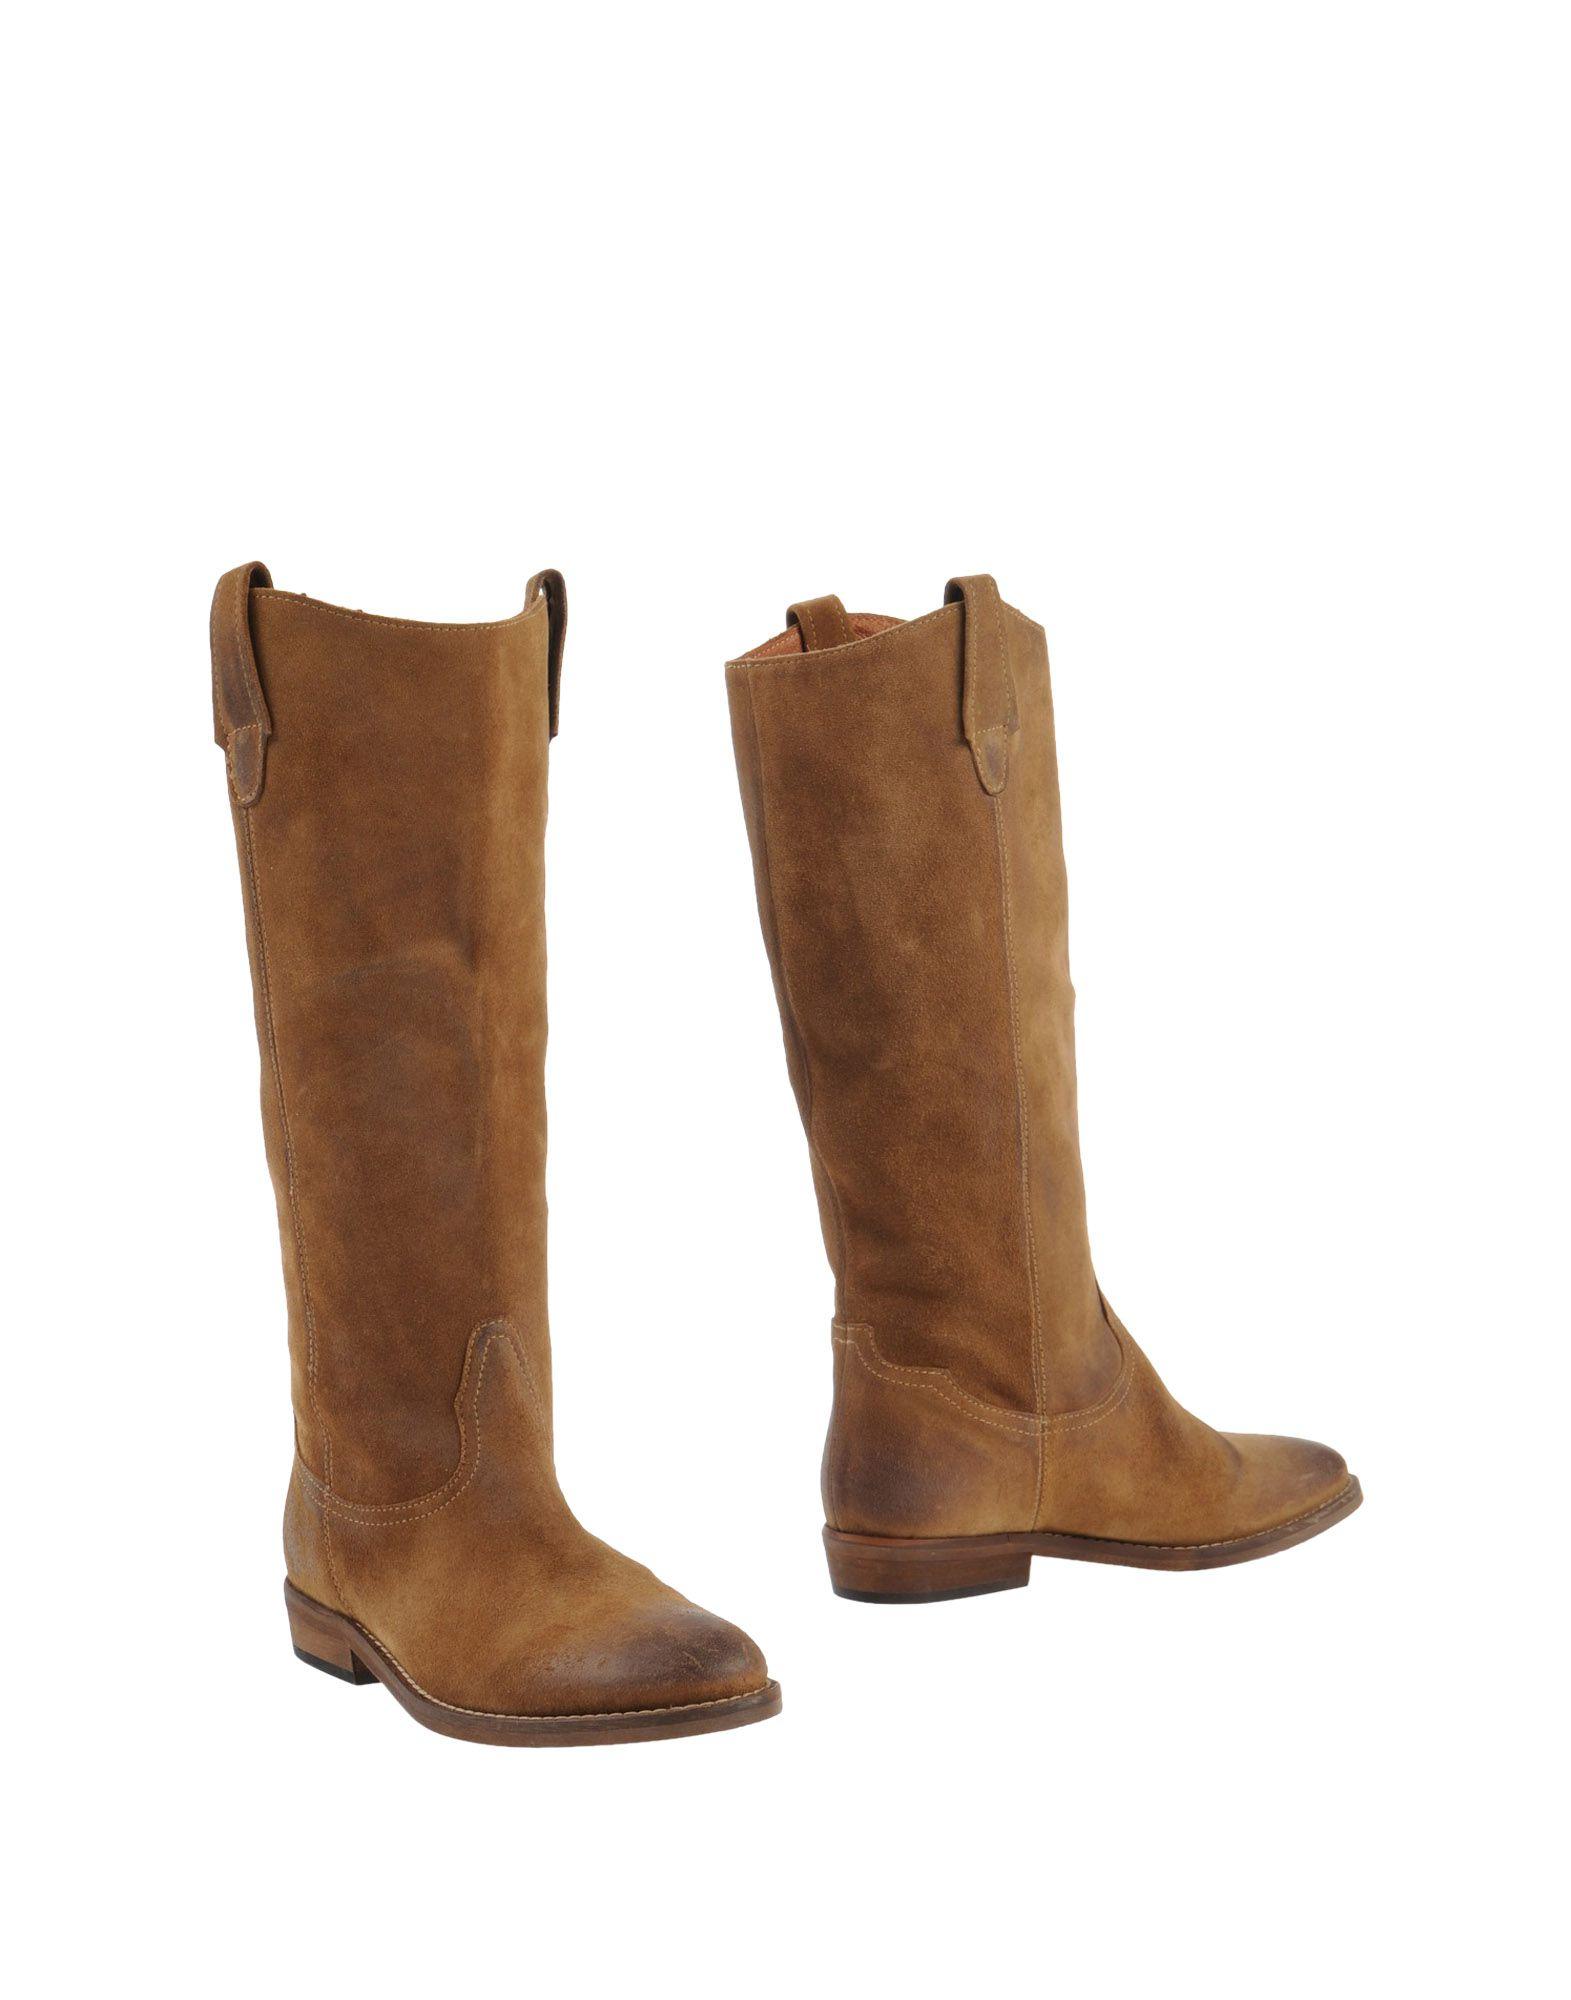 cbe96d6f40a0dc Lyst - Les Trois Garçons Boots in Natural